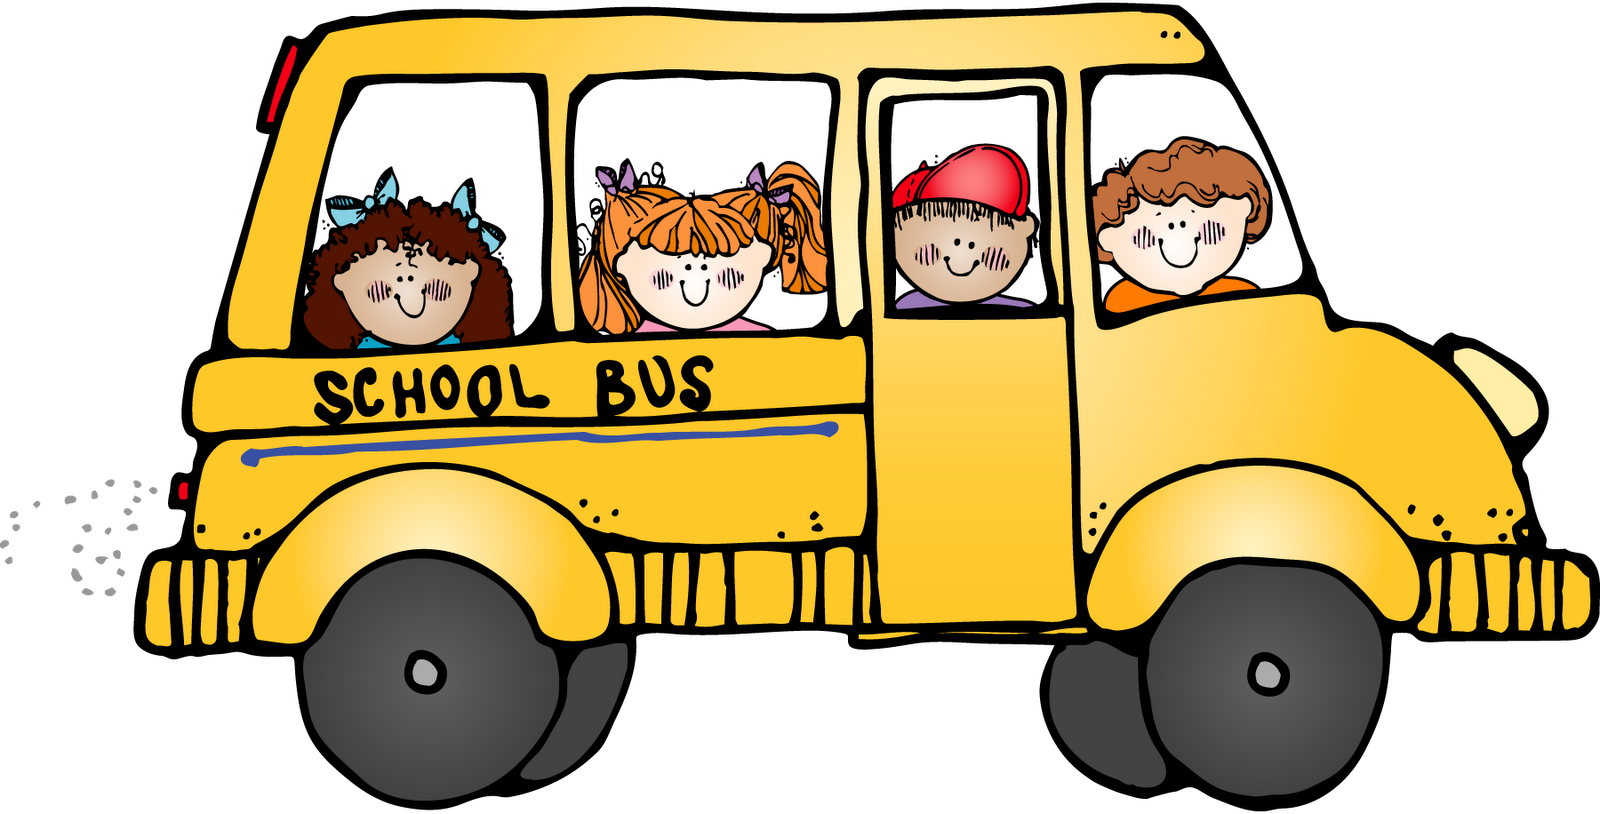 Bus-field-trip-clip-art-via-4-bp-blogspot-com-RlfxKu-clipart - PNG Field Trip